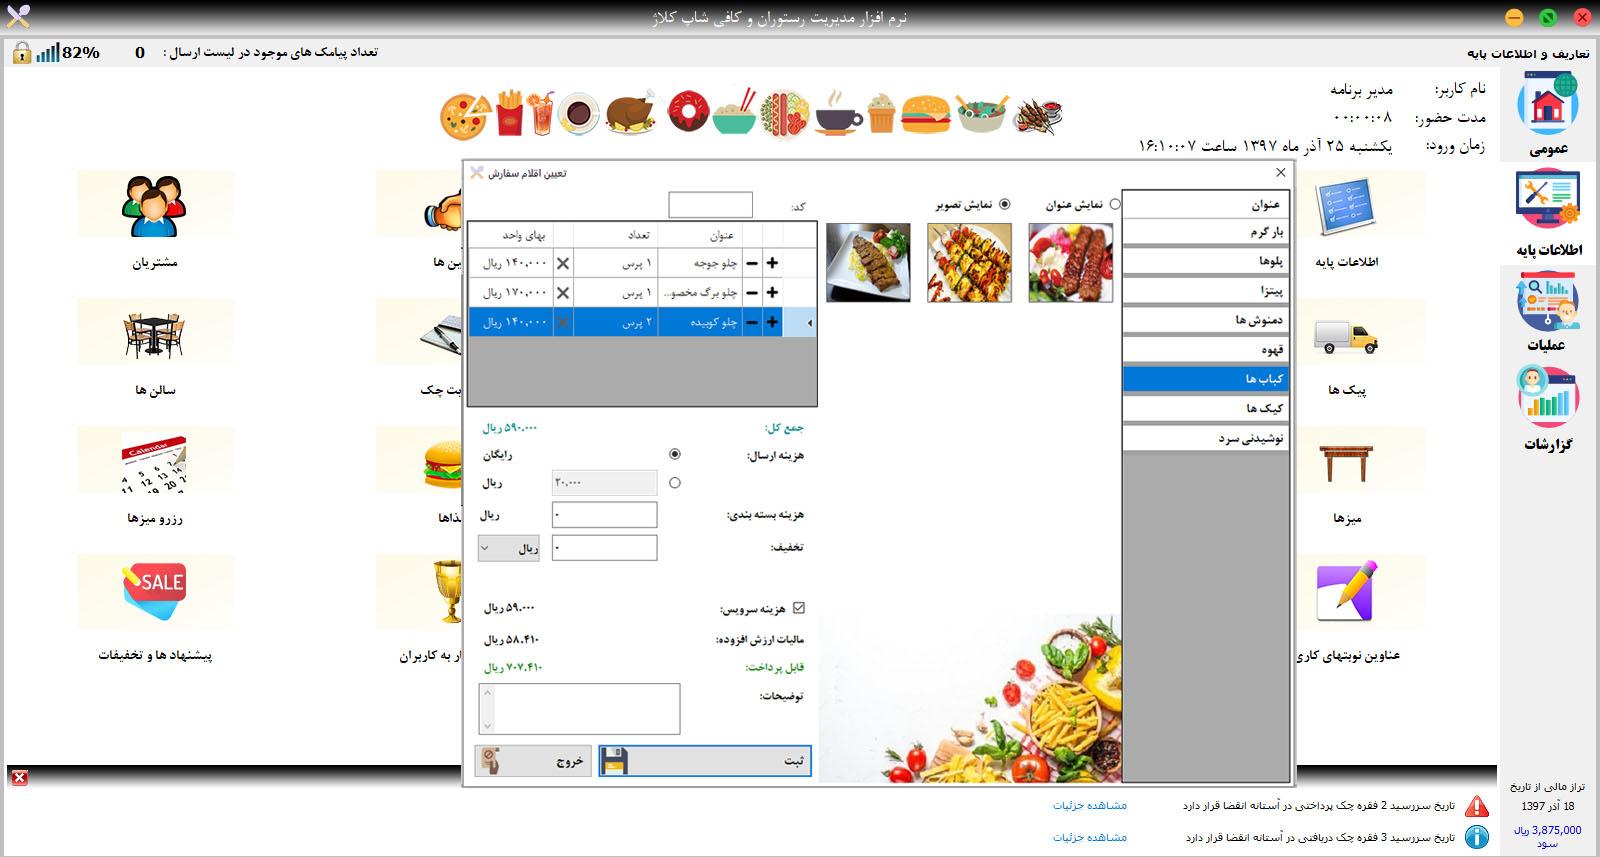 نرم افزار مدیریت رستوران و کافی شاپ کلاژ